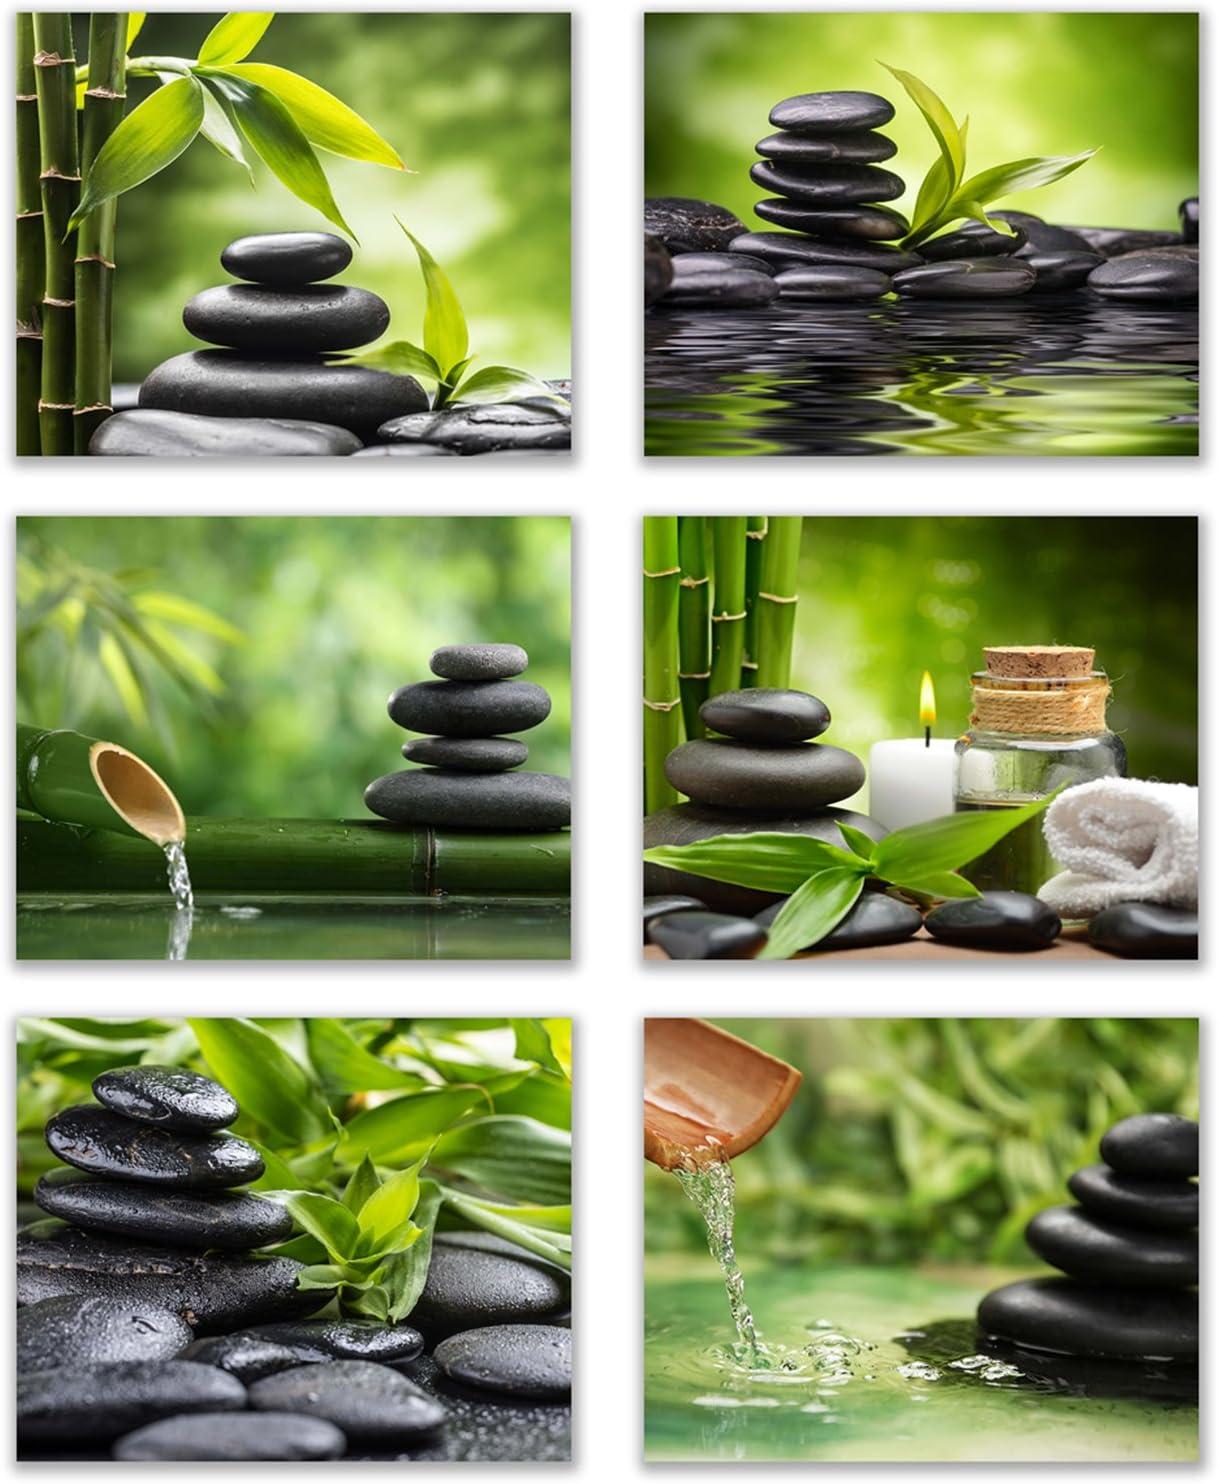 Infinity Creations Inspirational Zen/Spa Wall Photo Art: Set of 6-Relax and Motivate Beauty UNFRAMED Photo Art Prints (8